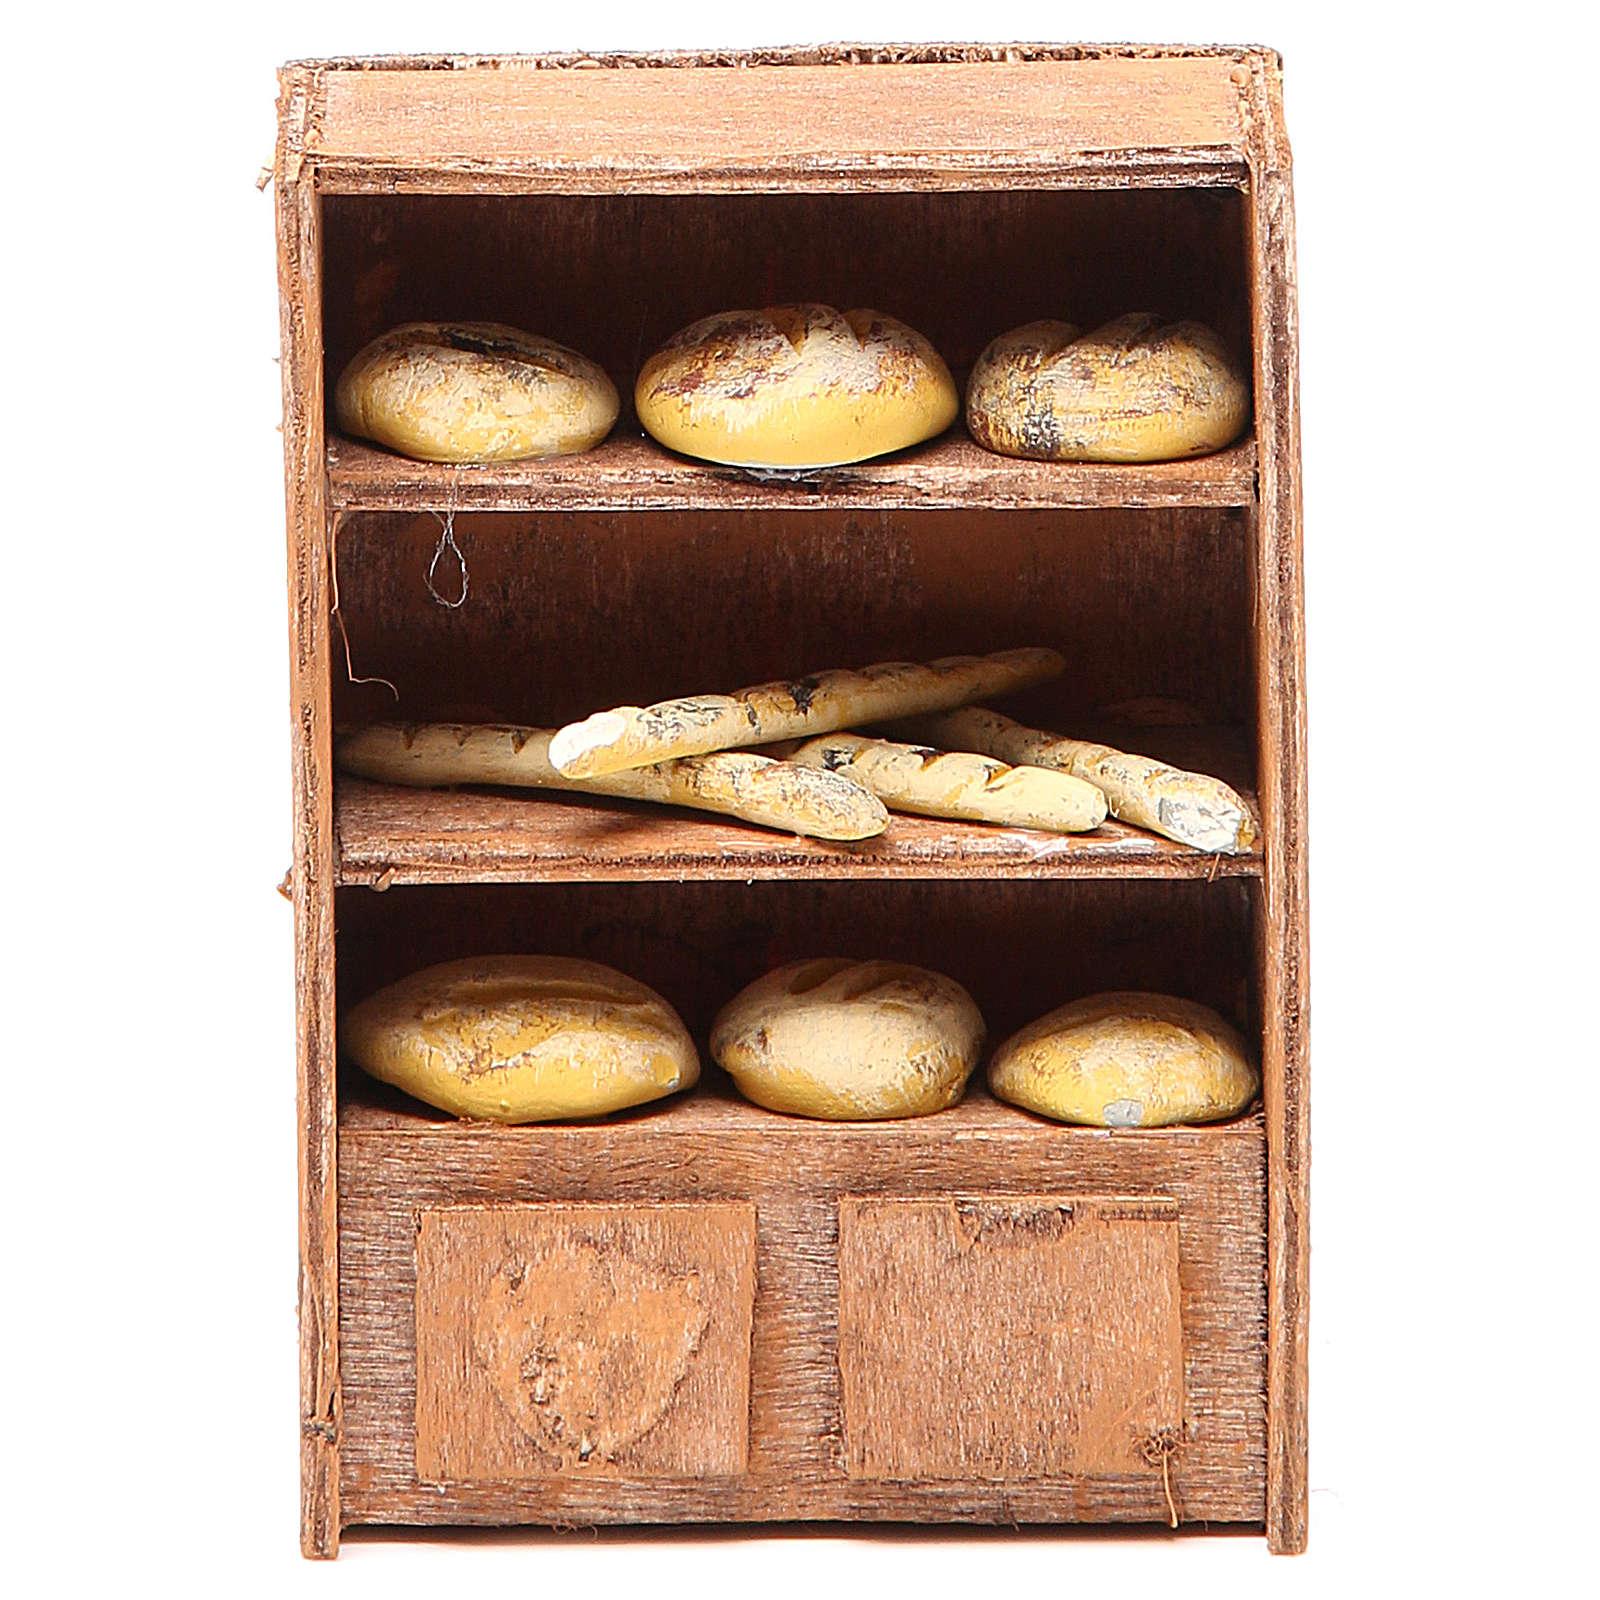 Bread Shelf for nativities of 12cm 4